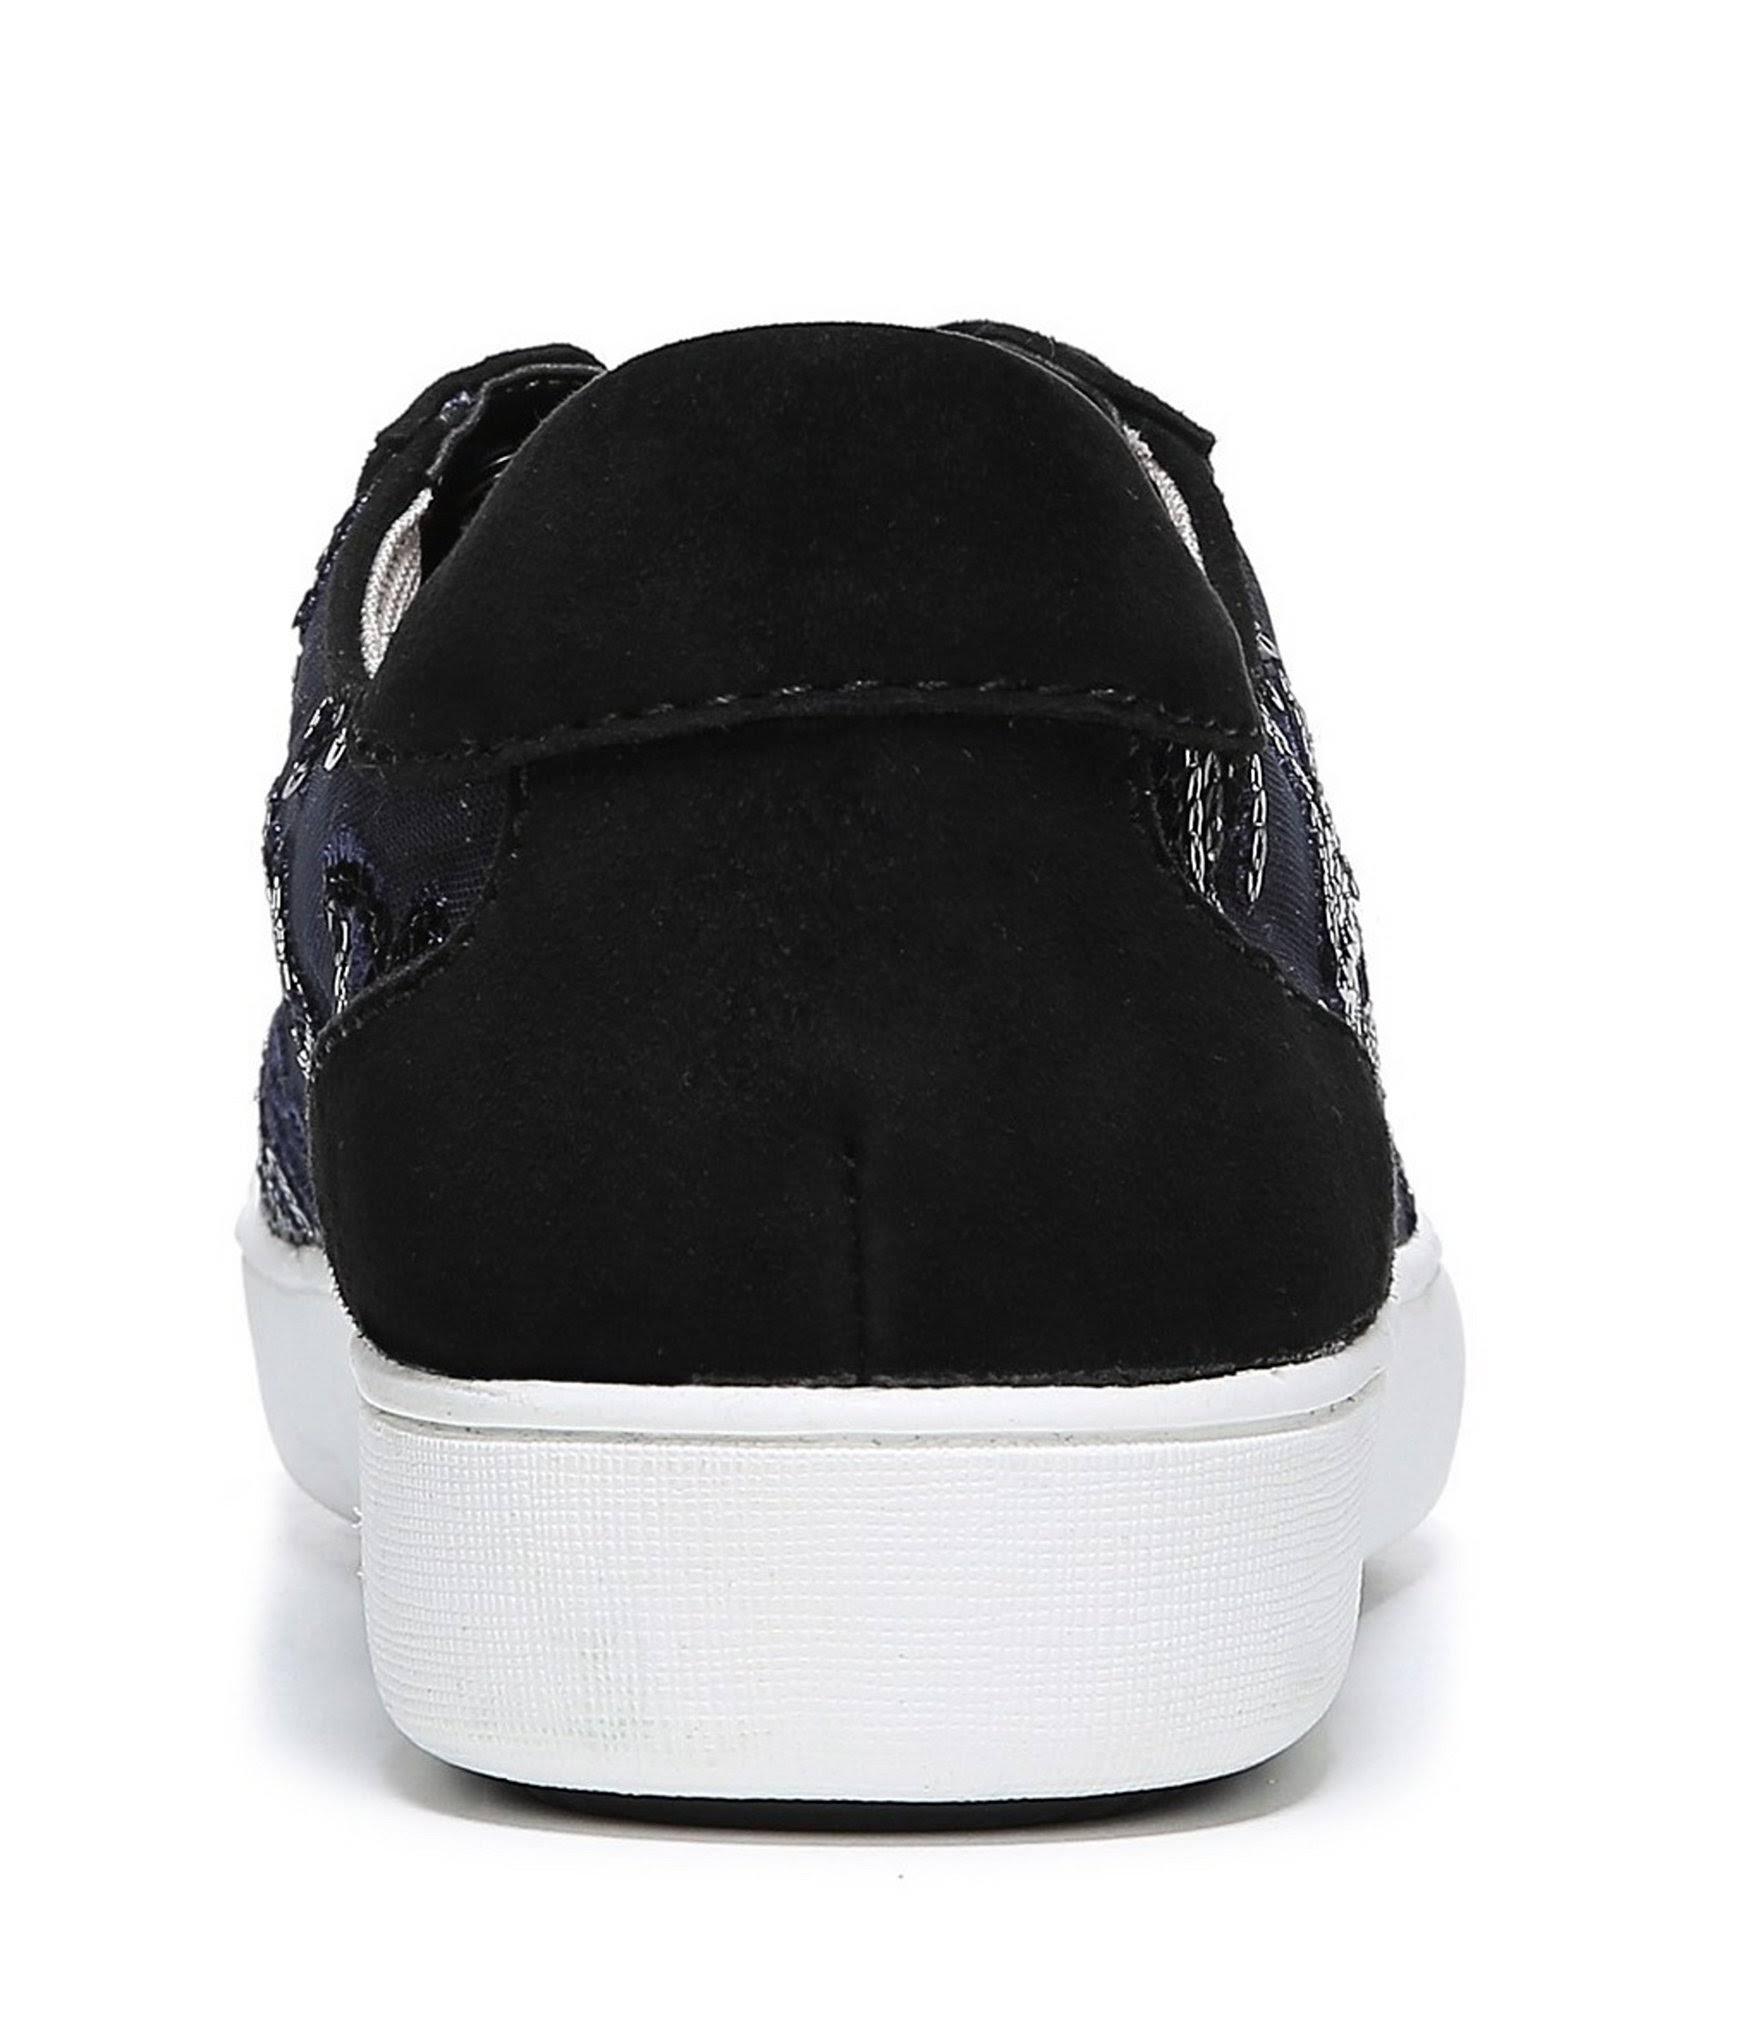 Sneaker Ricamato Da Blu Morrison 5Pizzo NaturalizerMisura5 Scuro Donna hdQCtrs